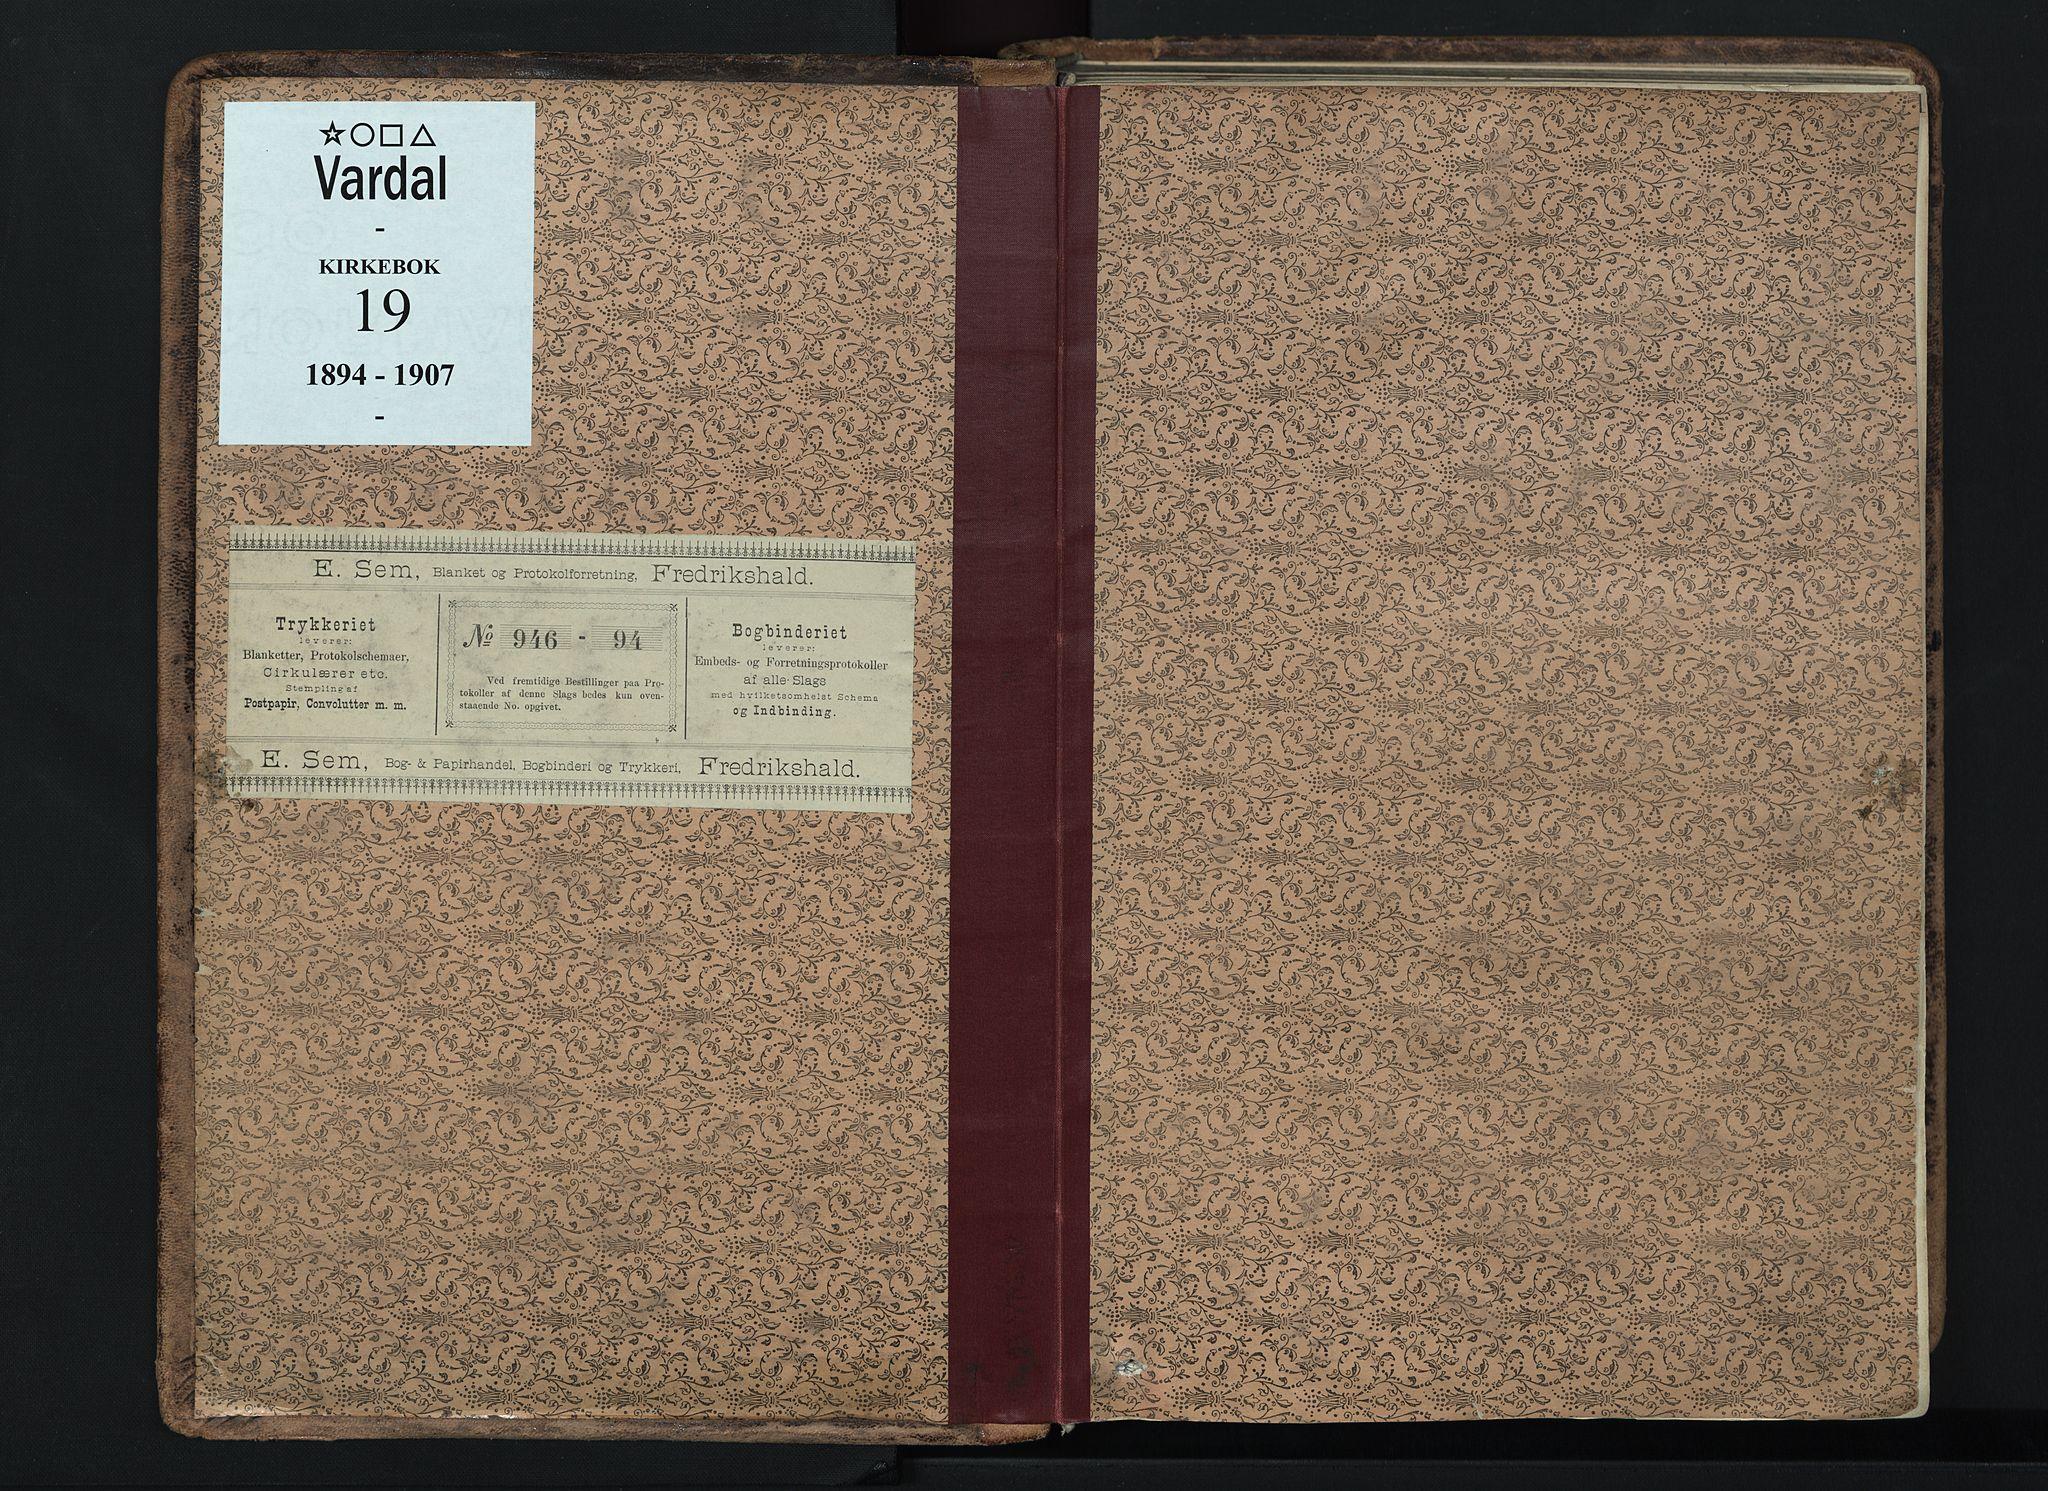 SAH, Vardal prestekontor, H/Ha/Haa/L0019: Ministerialbok nr. 19, 1893-1907